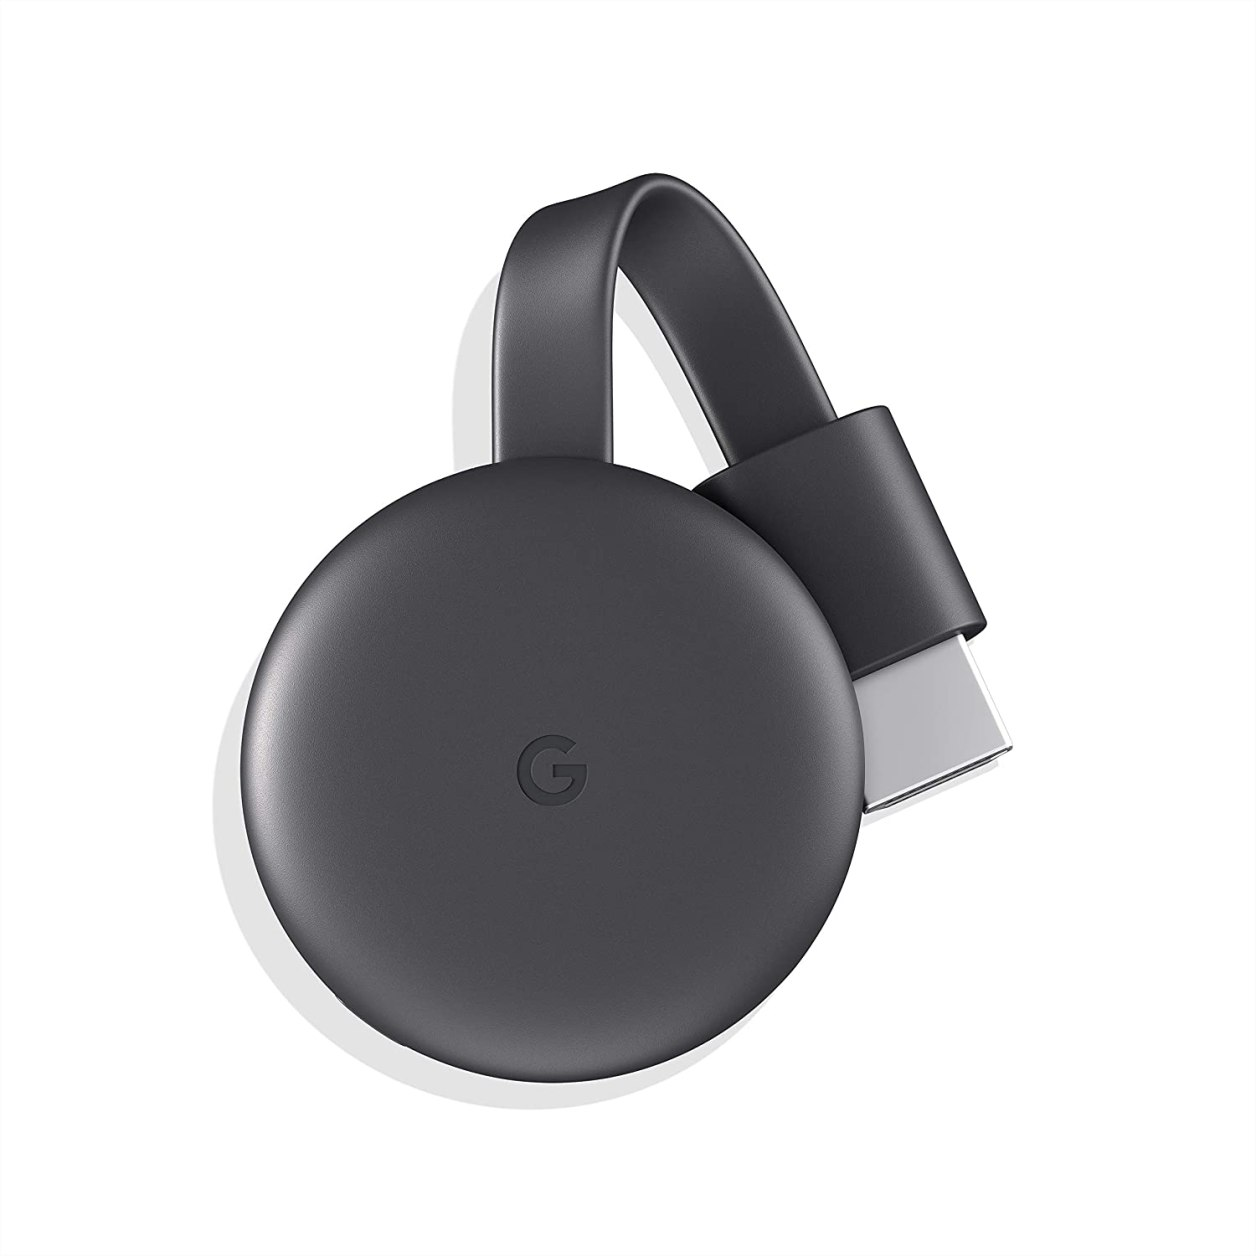 Amazon.co.jp: Google Chromecast 正規品 第三世代 2K対応 チャコール GA00439-JP: パソコン・周辺機器